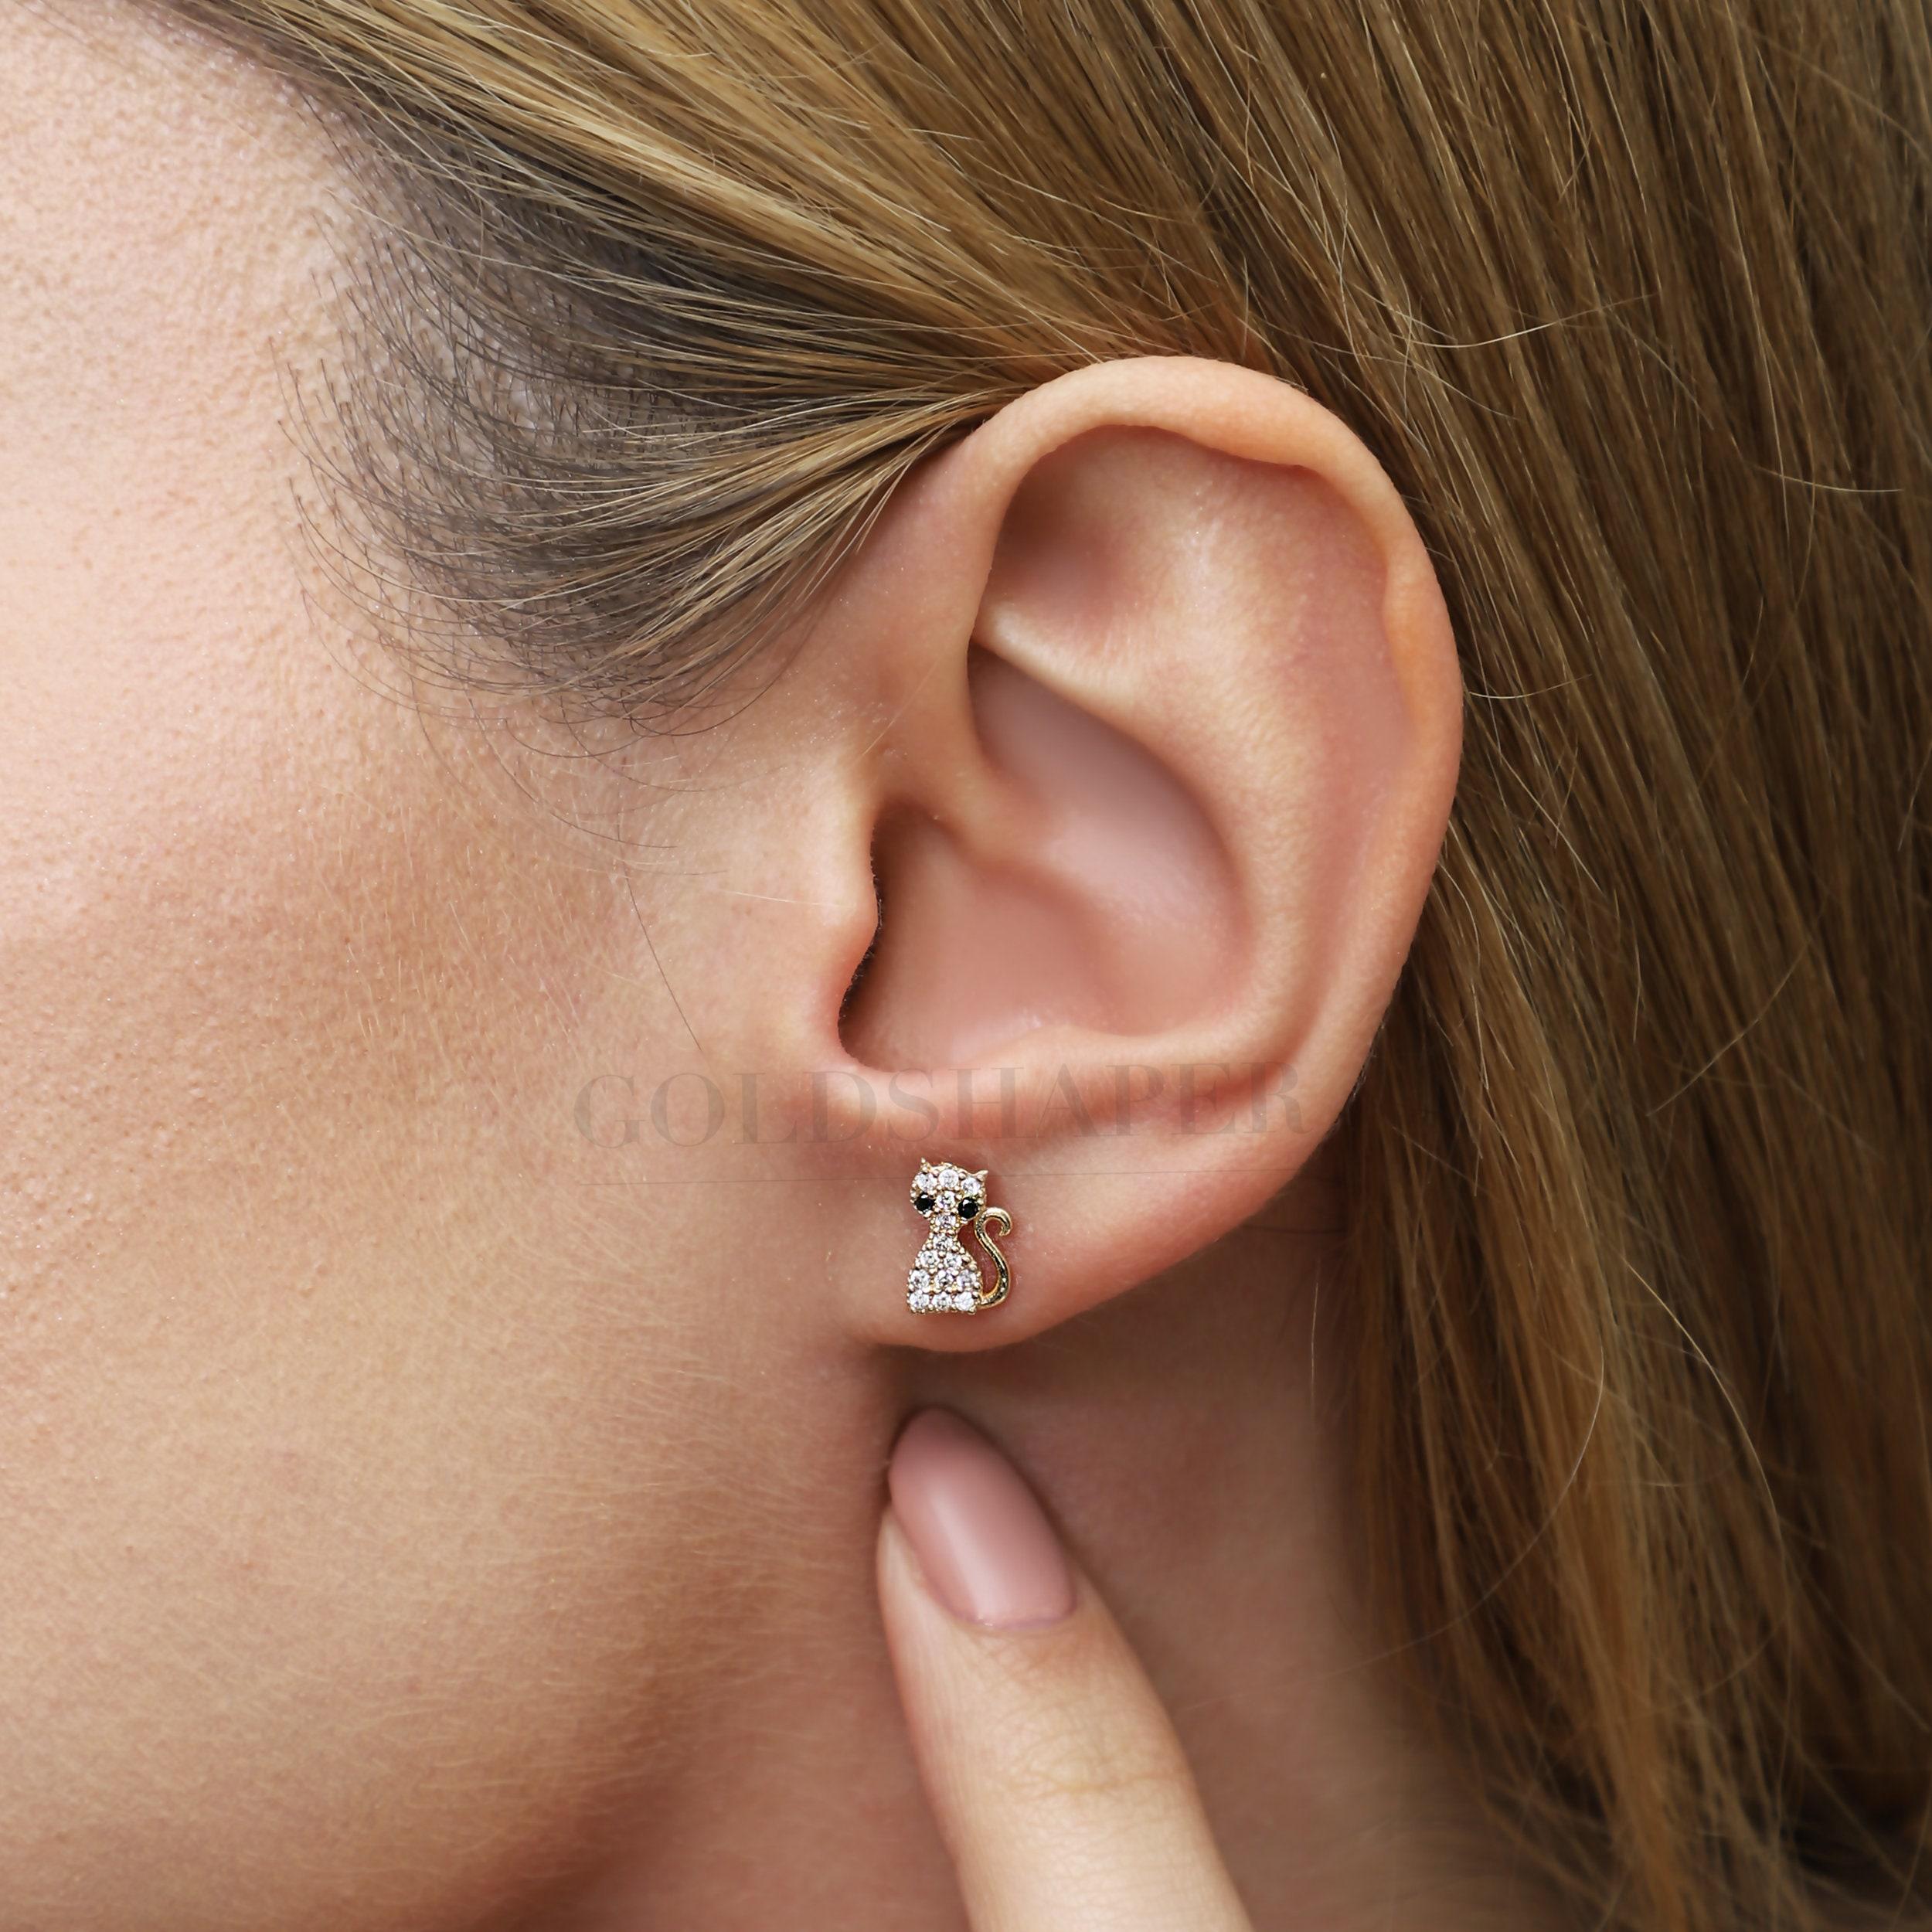 Tiny Cat Earrings, 14K Solid Gold Animal Valentine's Day Gift, Girlfriend Christmas Wedding Birthday Gift